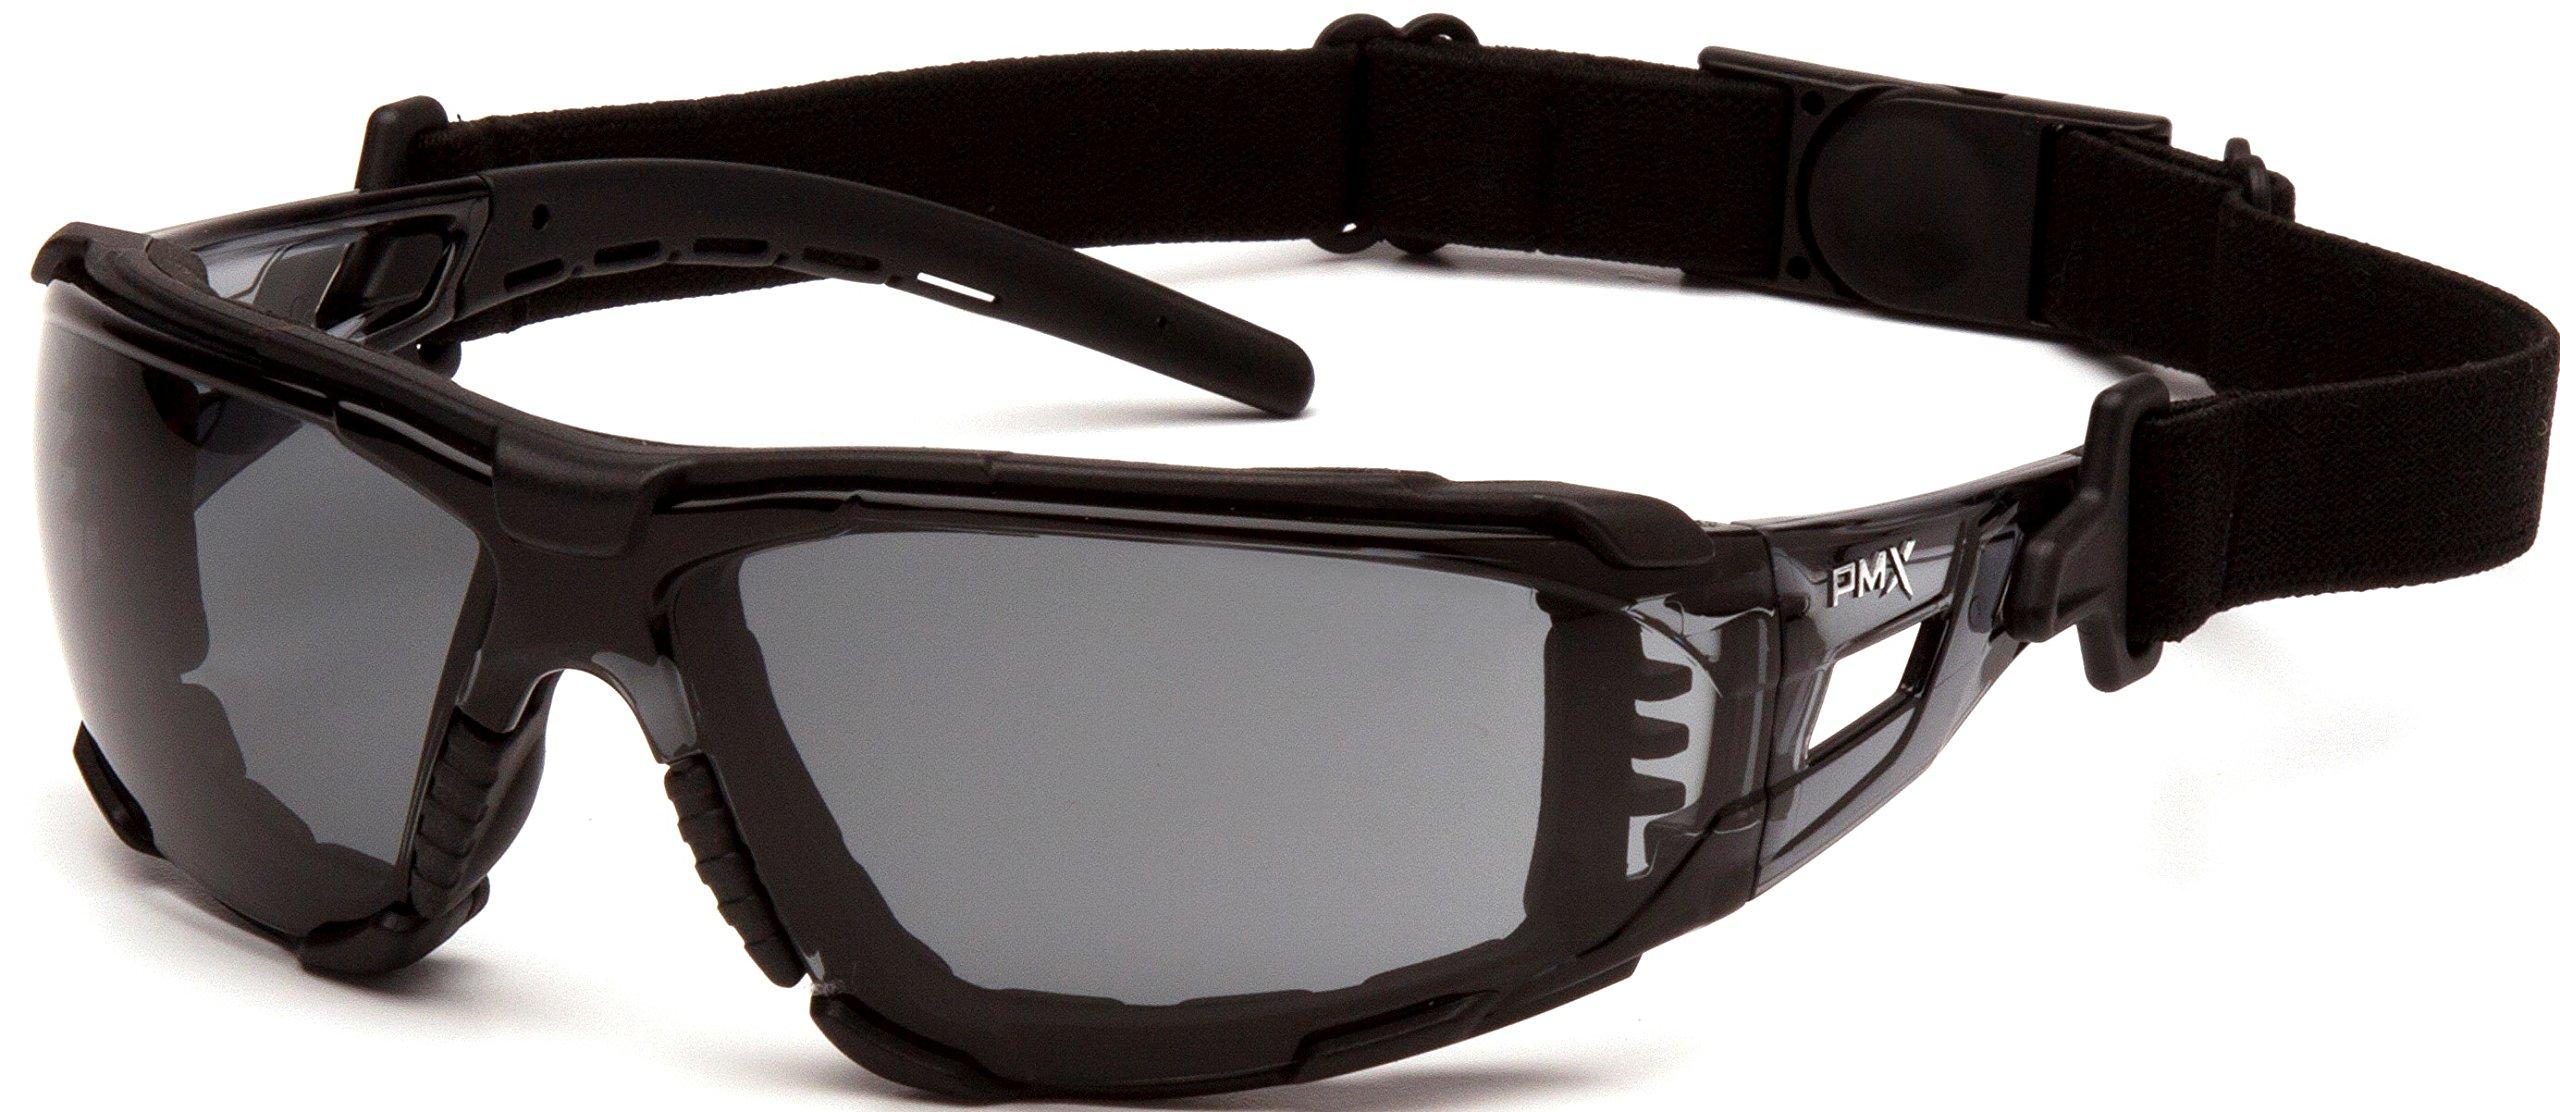 Pyramex Safety SB10220STMFP Fyxate Safety Glasses, Gray H2MAX Anti-Fog with Foam Padding